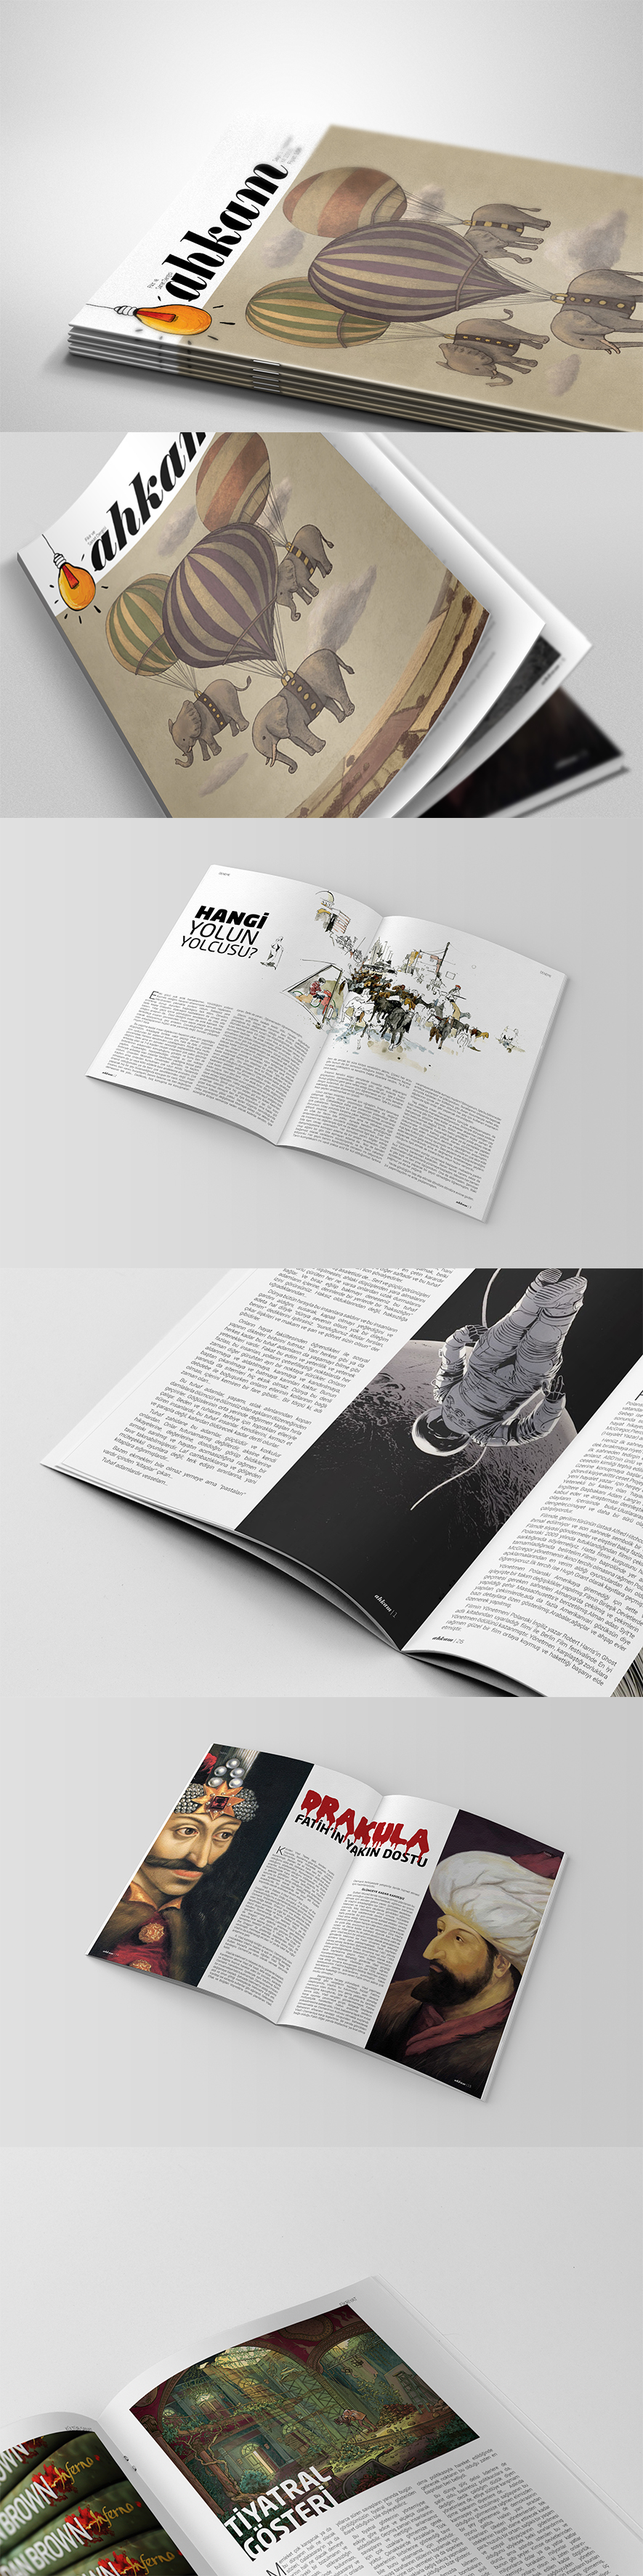 magazine Ahkam Dergi kultur sanat culture literature art edebiyat